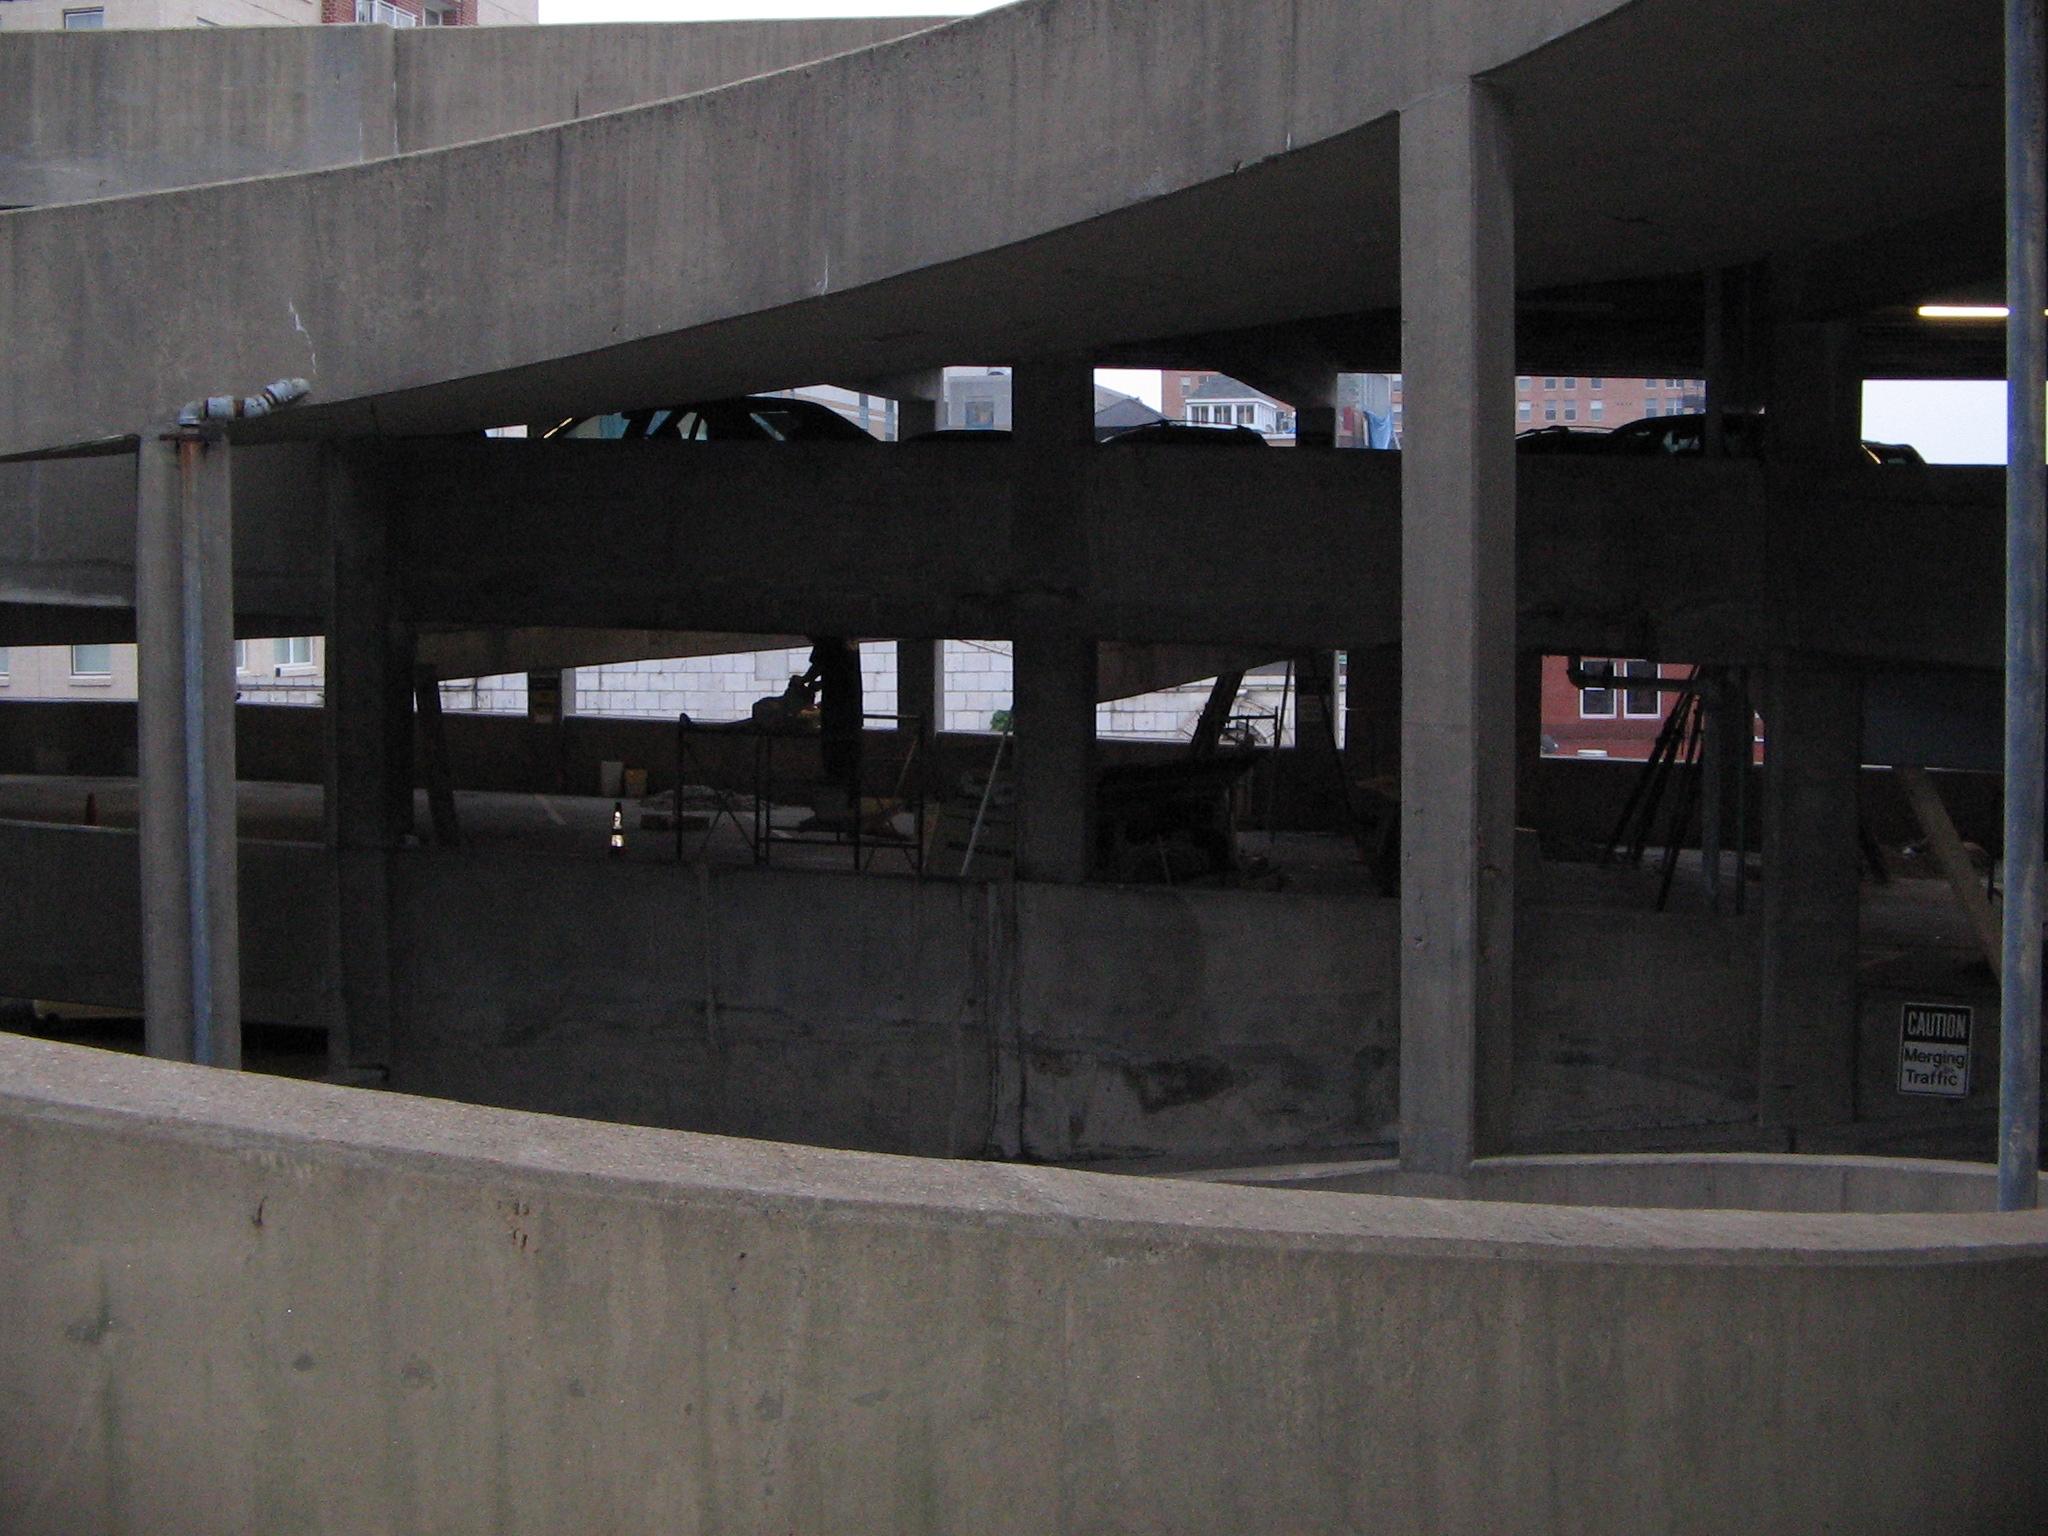 overhead-parking-garage-repair-deterioriation